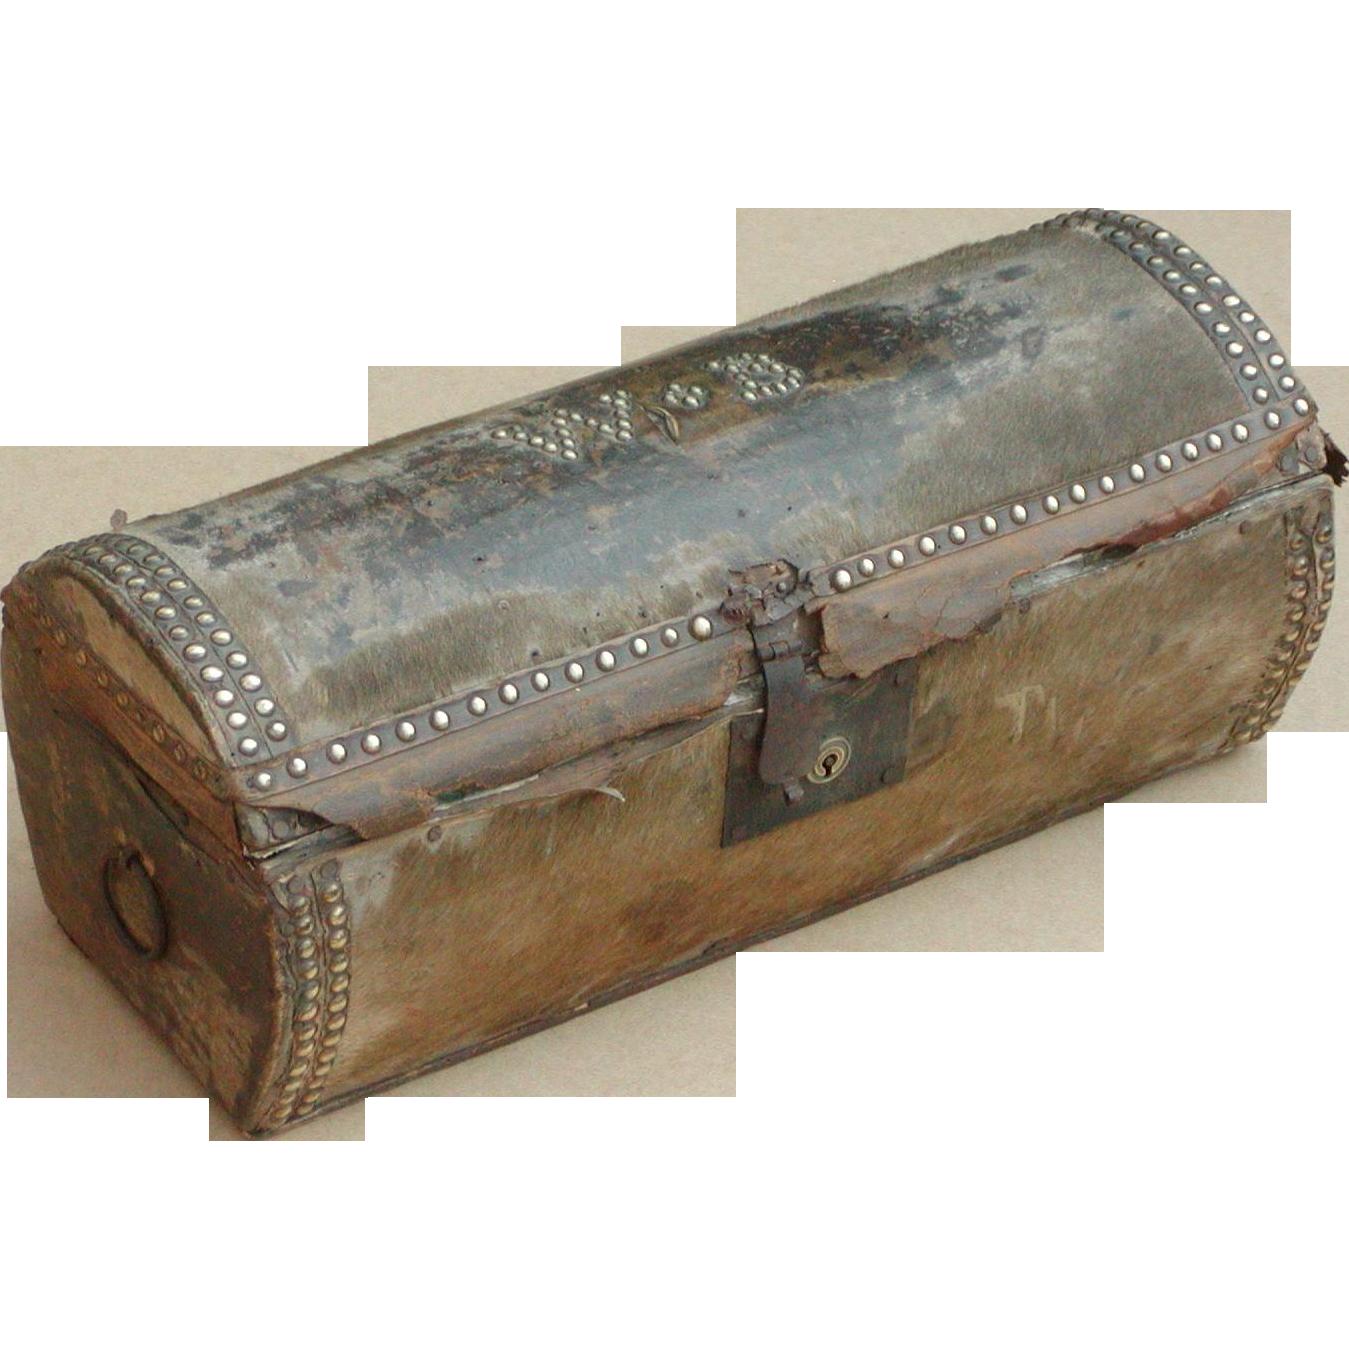 Trunk...Log trunk...Stagecoach trunk...